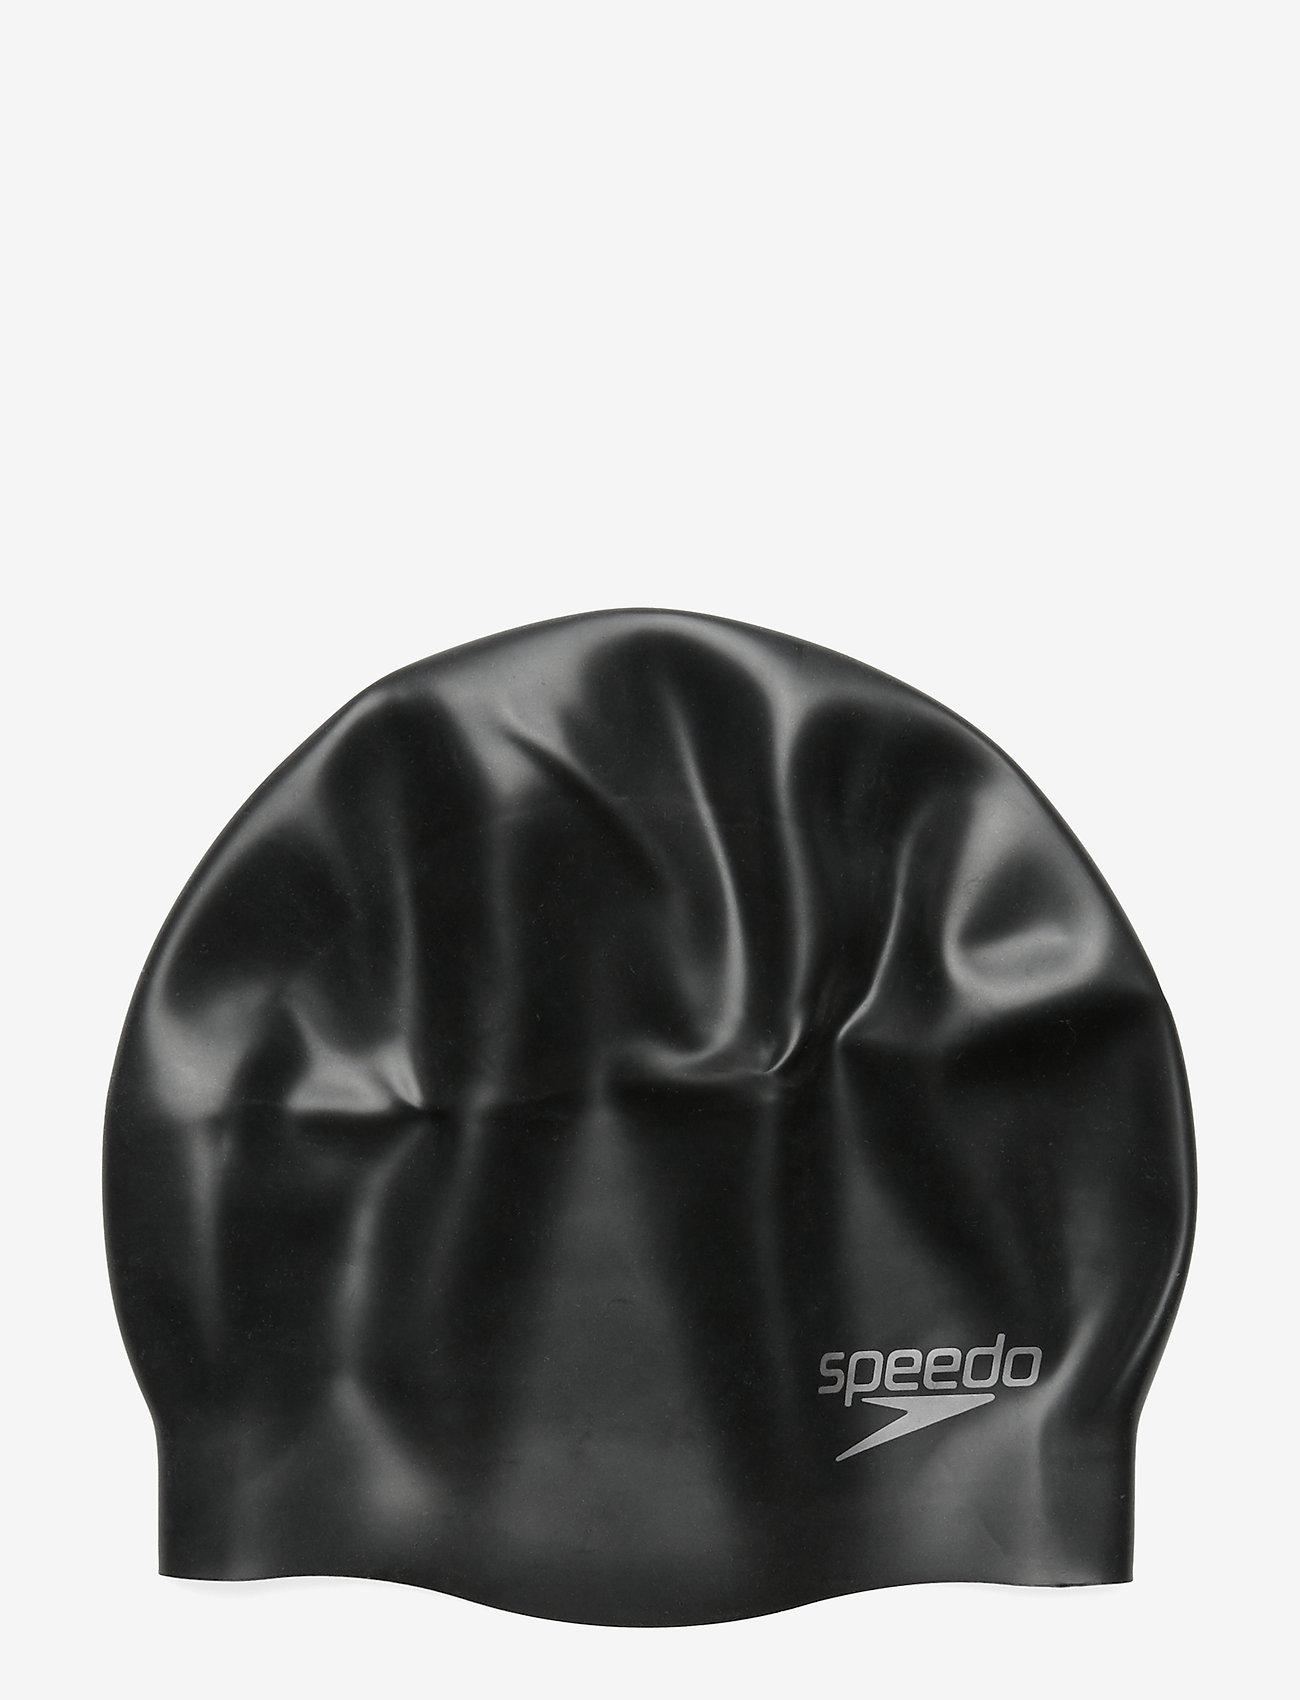 Speedo - SPEEDO SILICON MOULDED CAP AU, WHI MOP - overige accessoires - black - 0